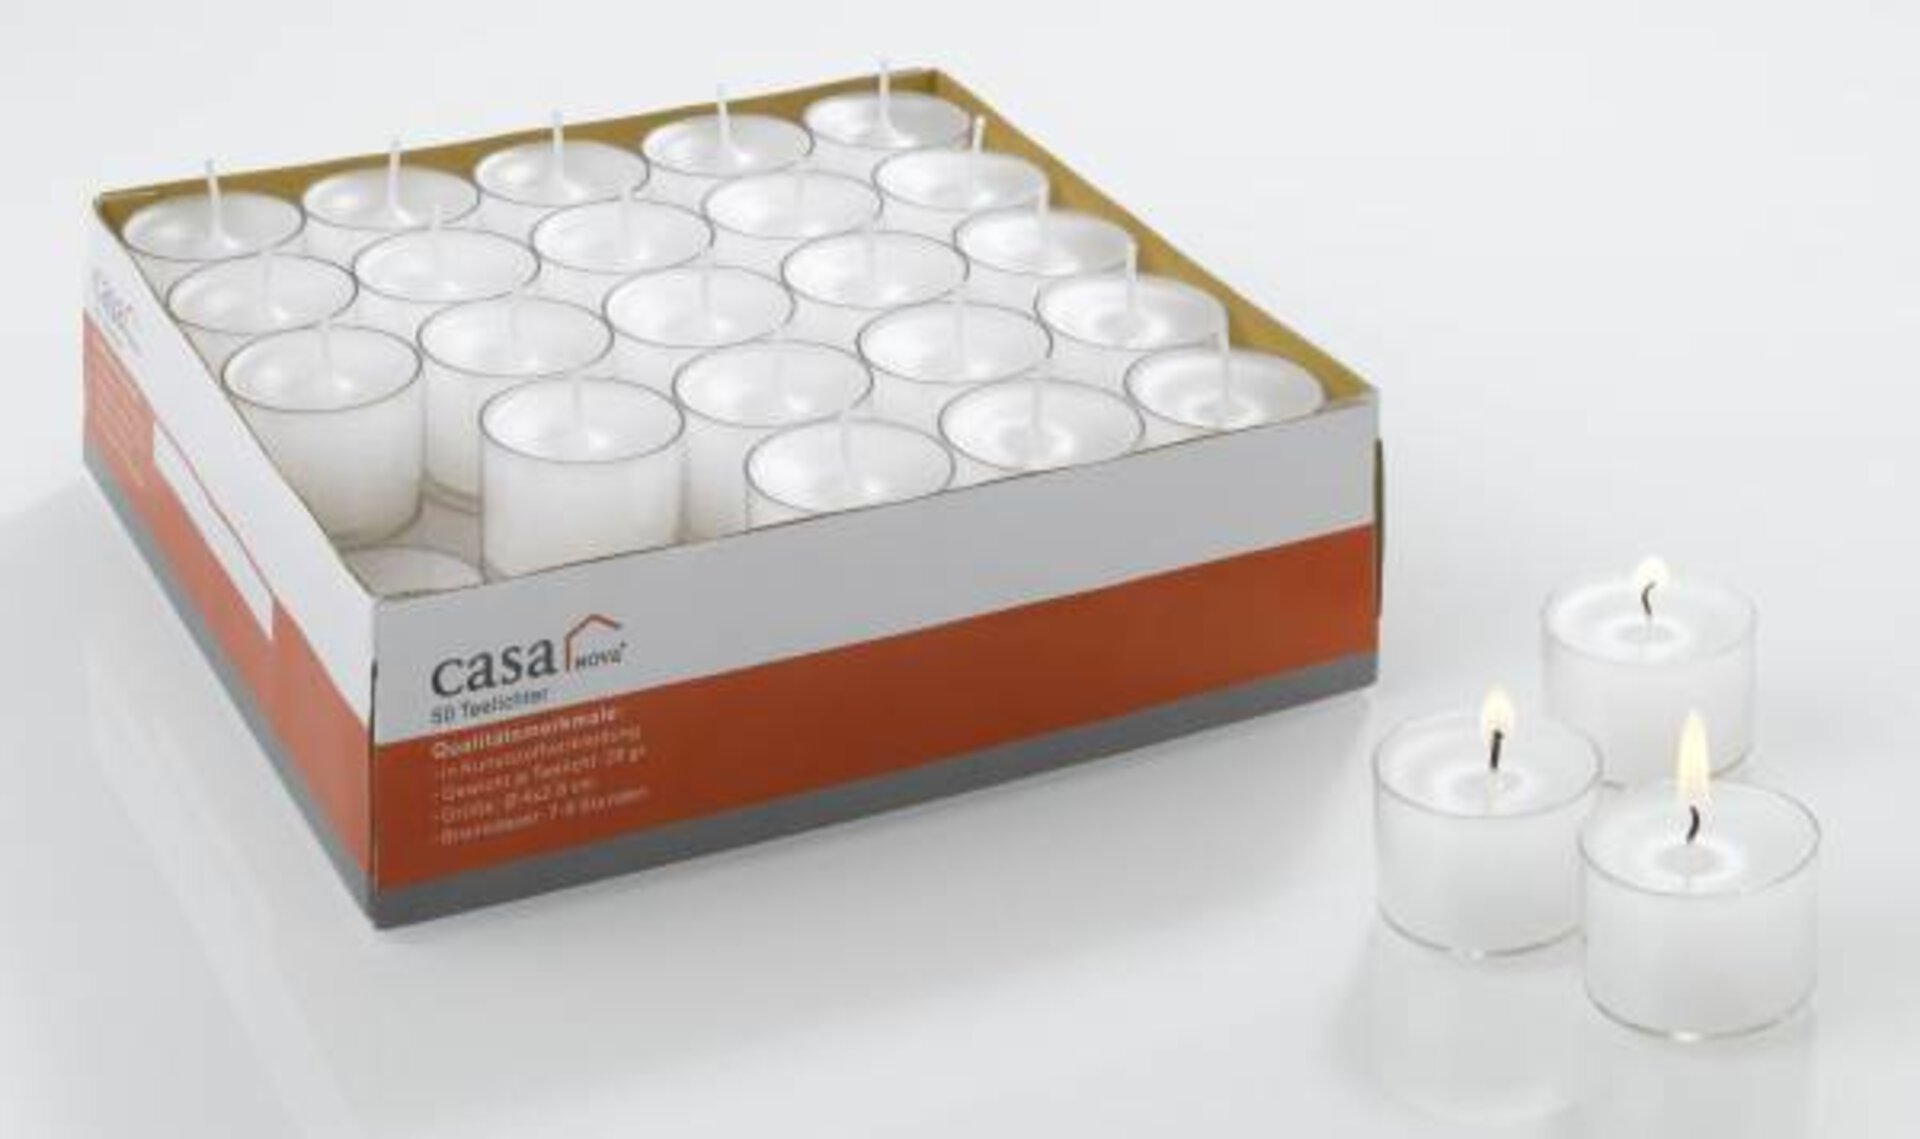 Kerze 151000 Casa Nova Cixi Casa Nova Wachs weiß